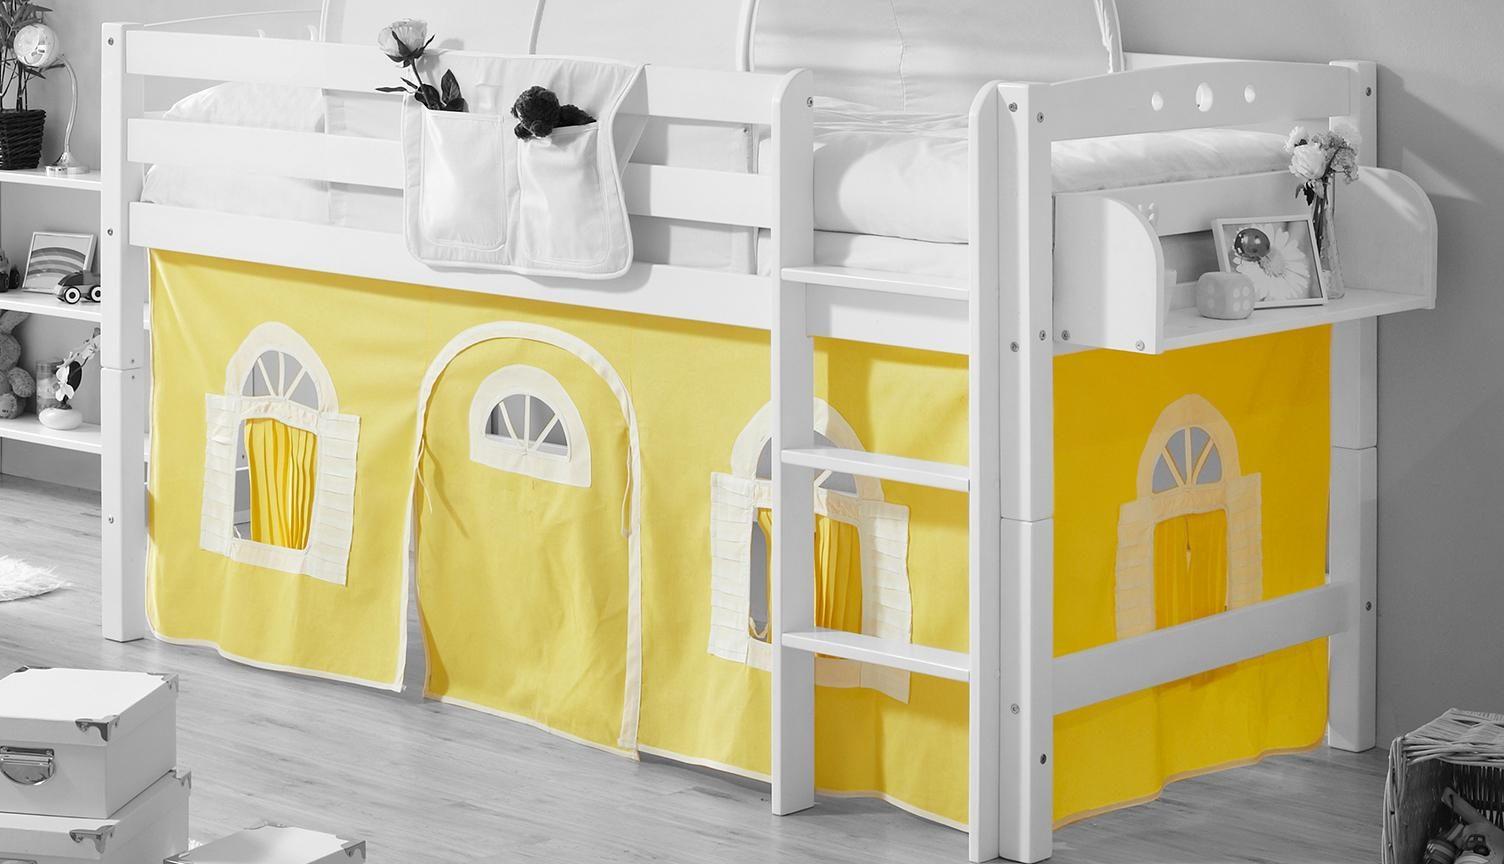 Ticaa Etagenbett Vorhang : Ticaa vorhang set landhausoptik online kaufen otto